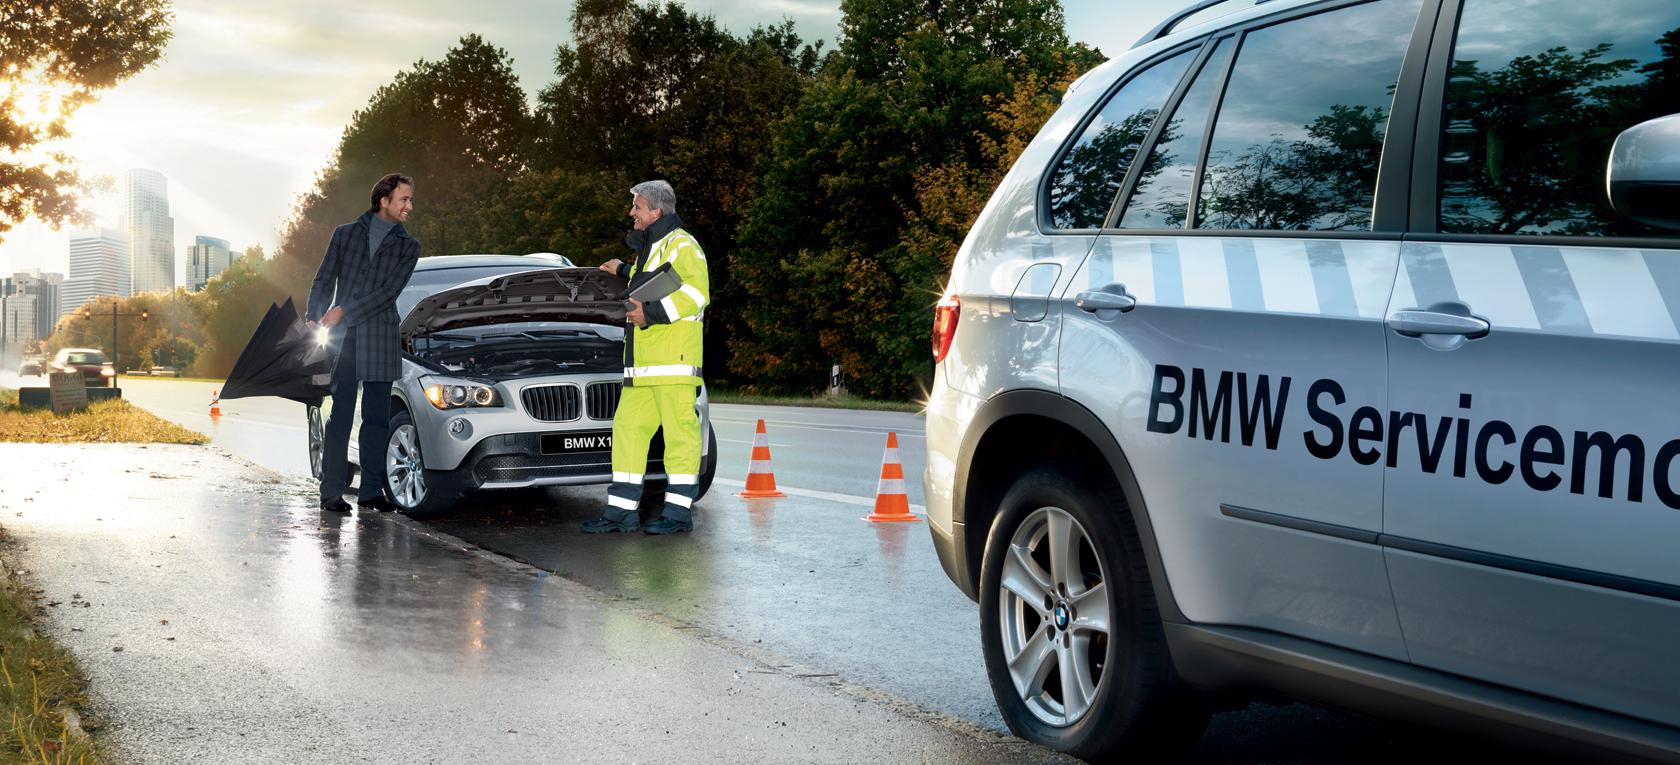 bmw-roadside-assistance